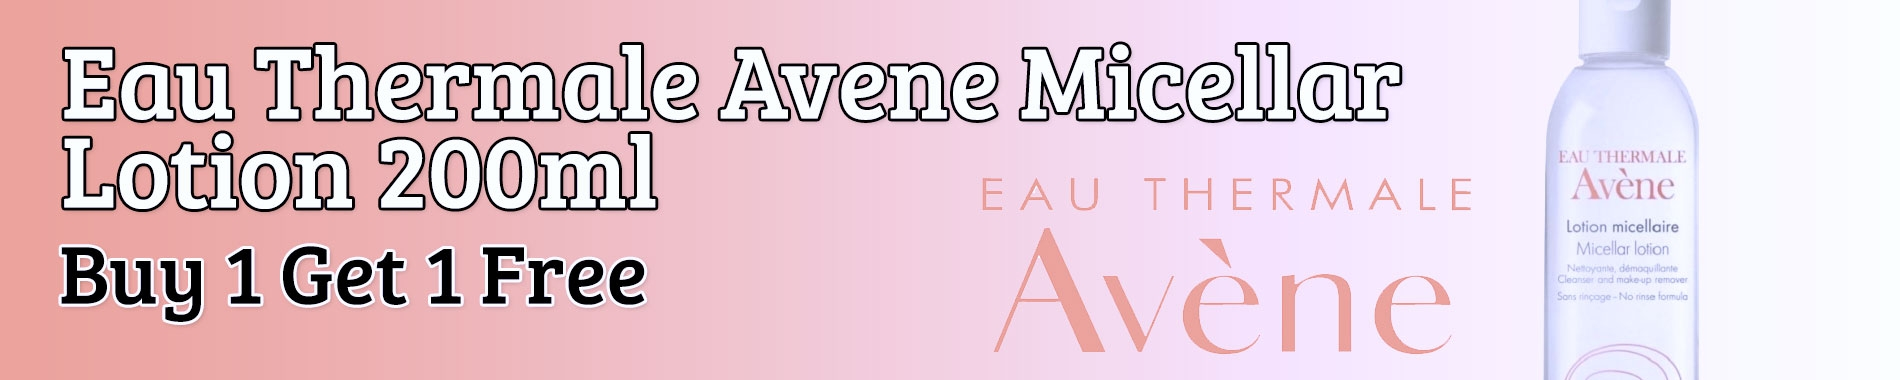 Eau Thermale Avene Micellar Lotion 200ml - Buy 1 Get 1 Free